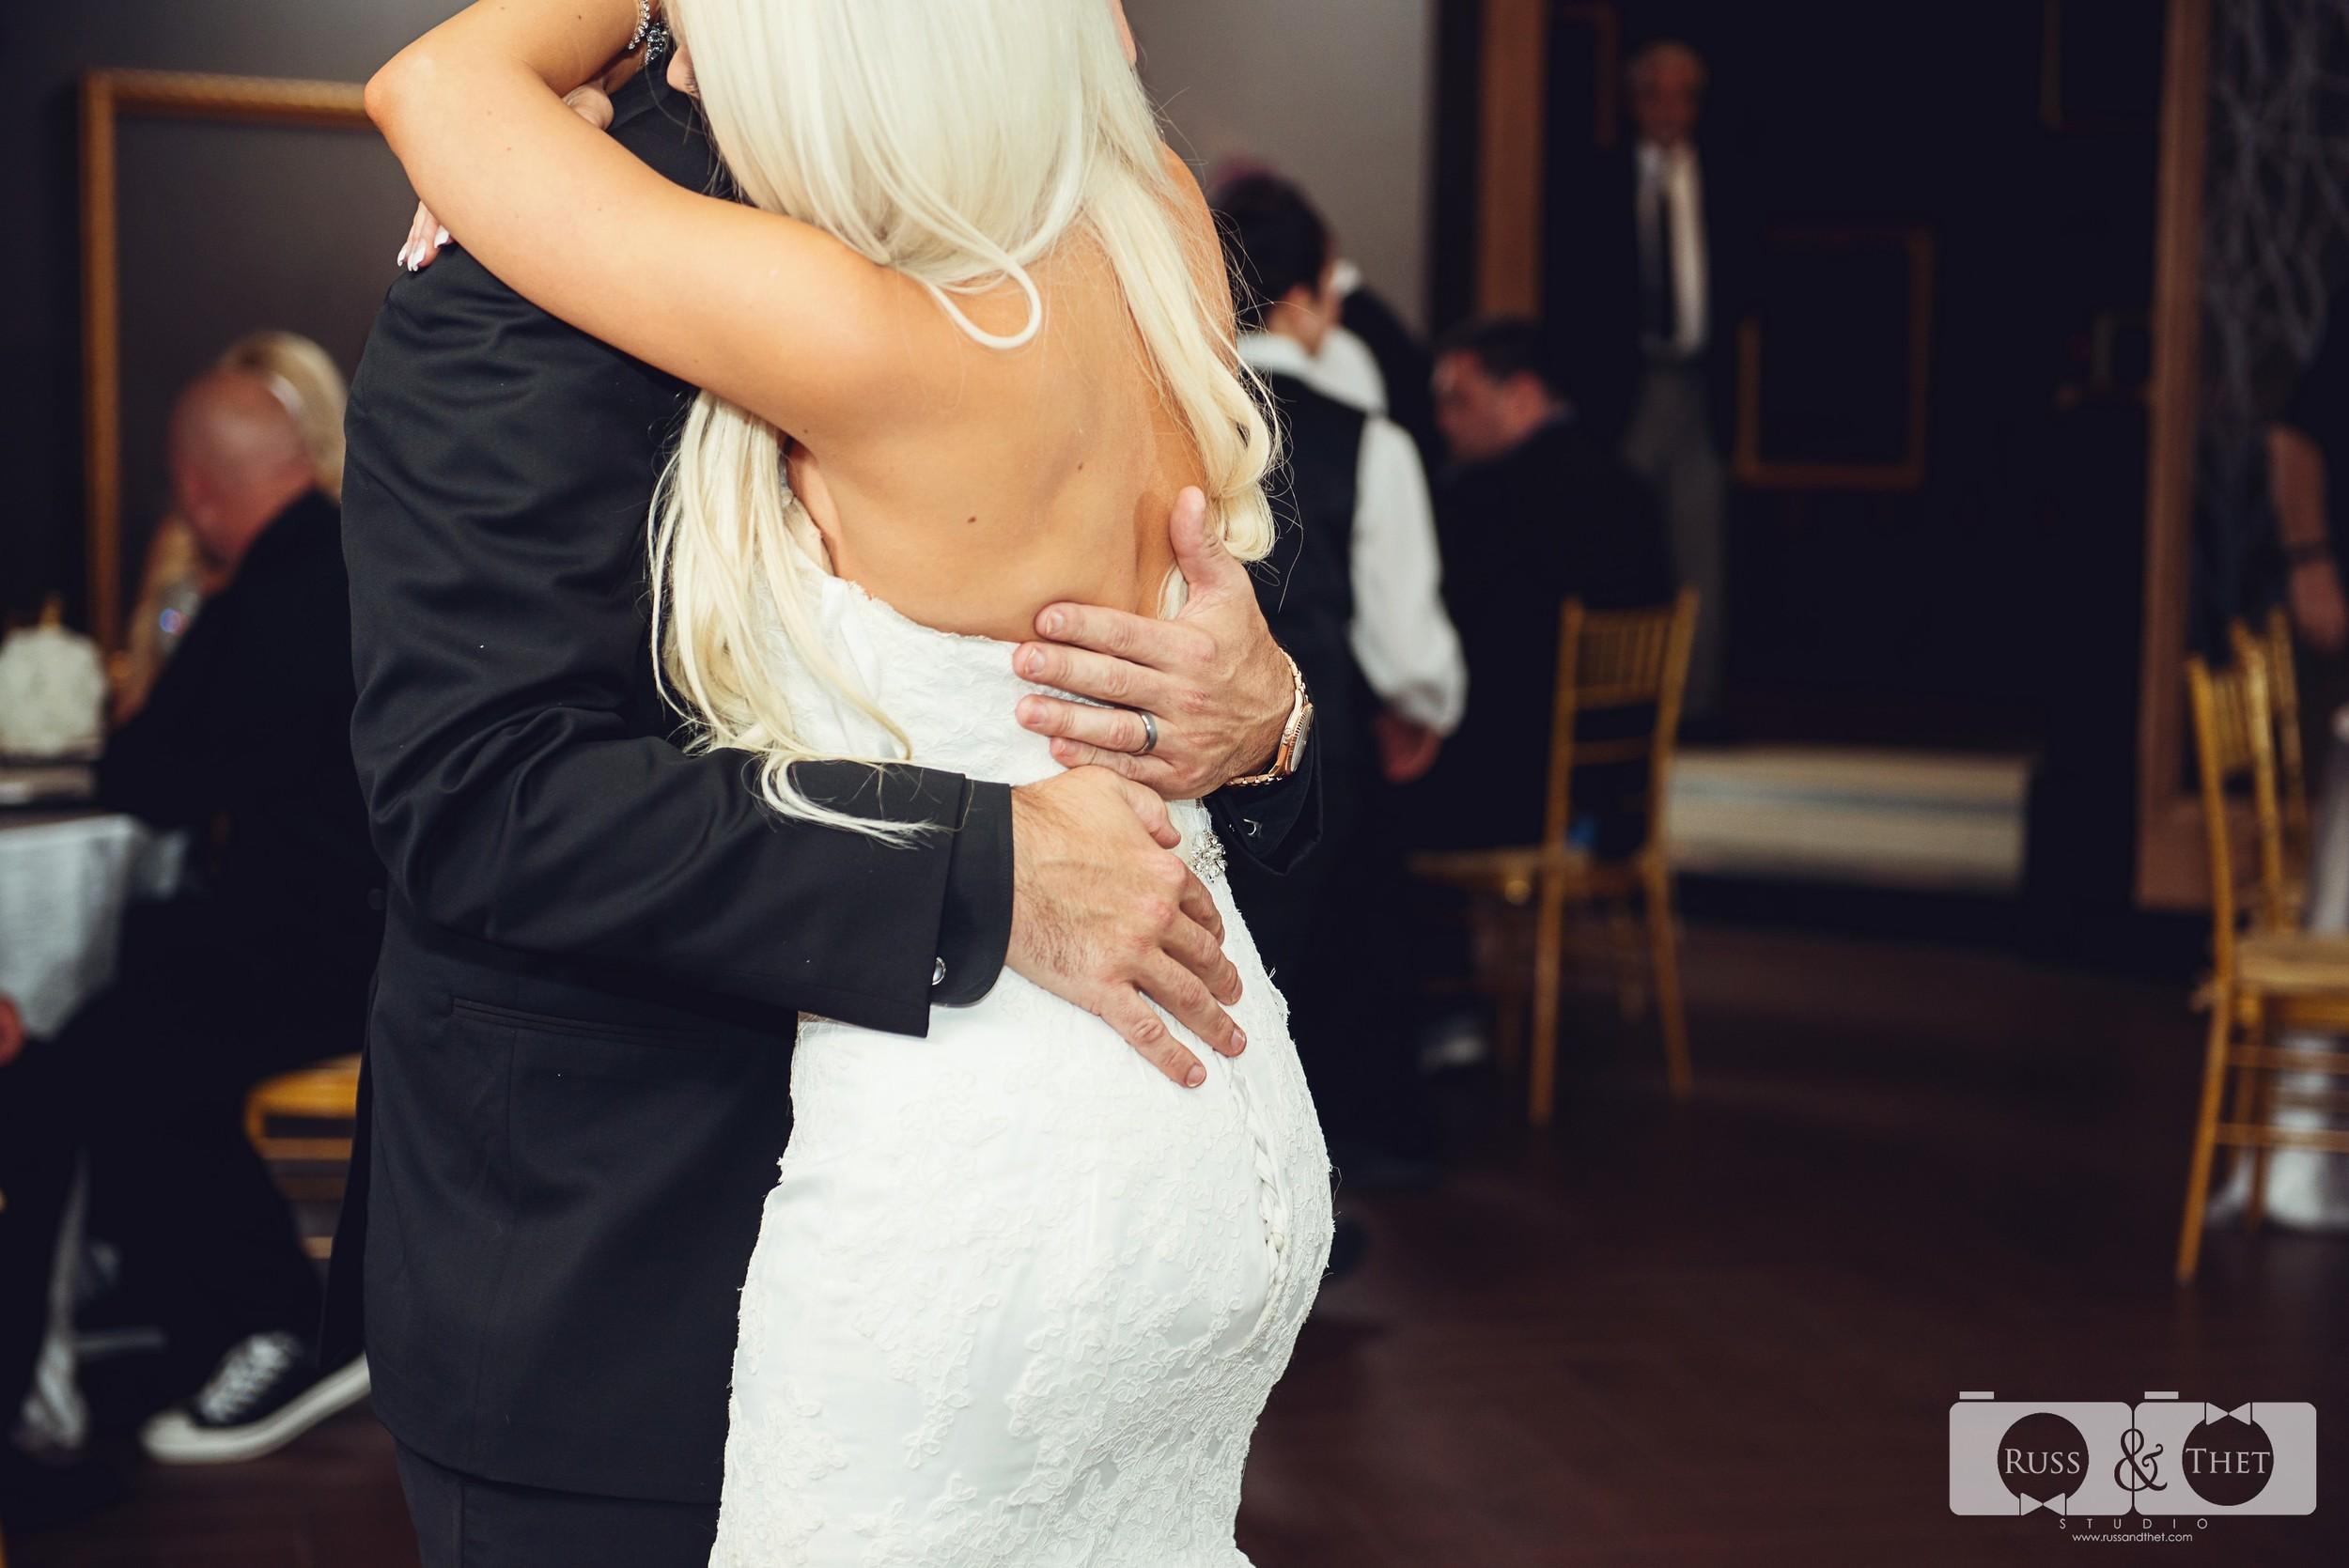 Jon&Kimee-The-Hills-Hotel-Wedding-Photographer (65).jpg